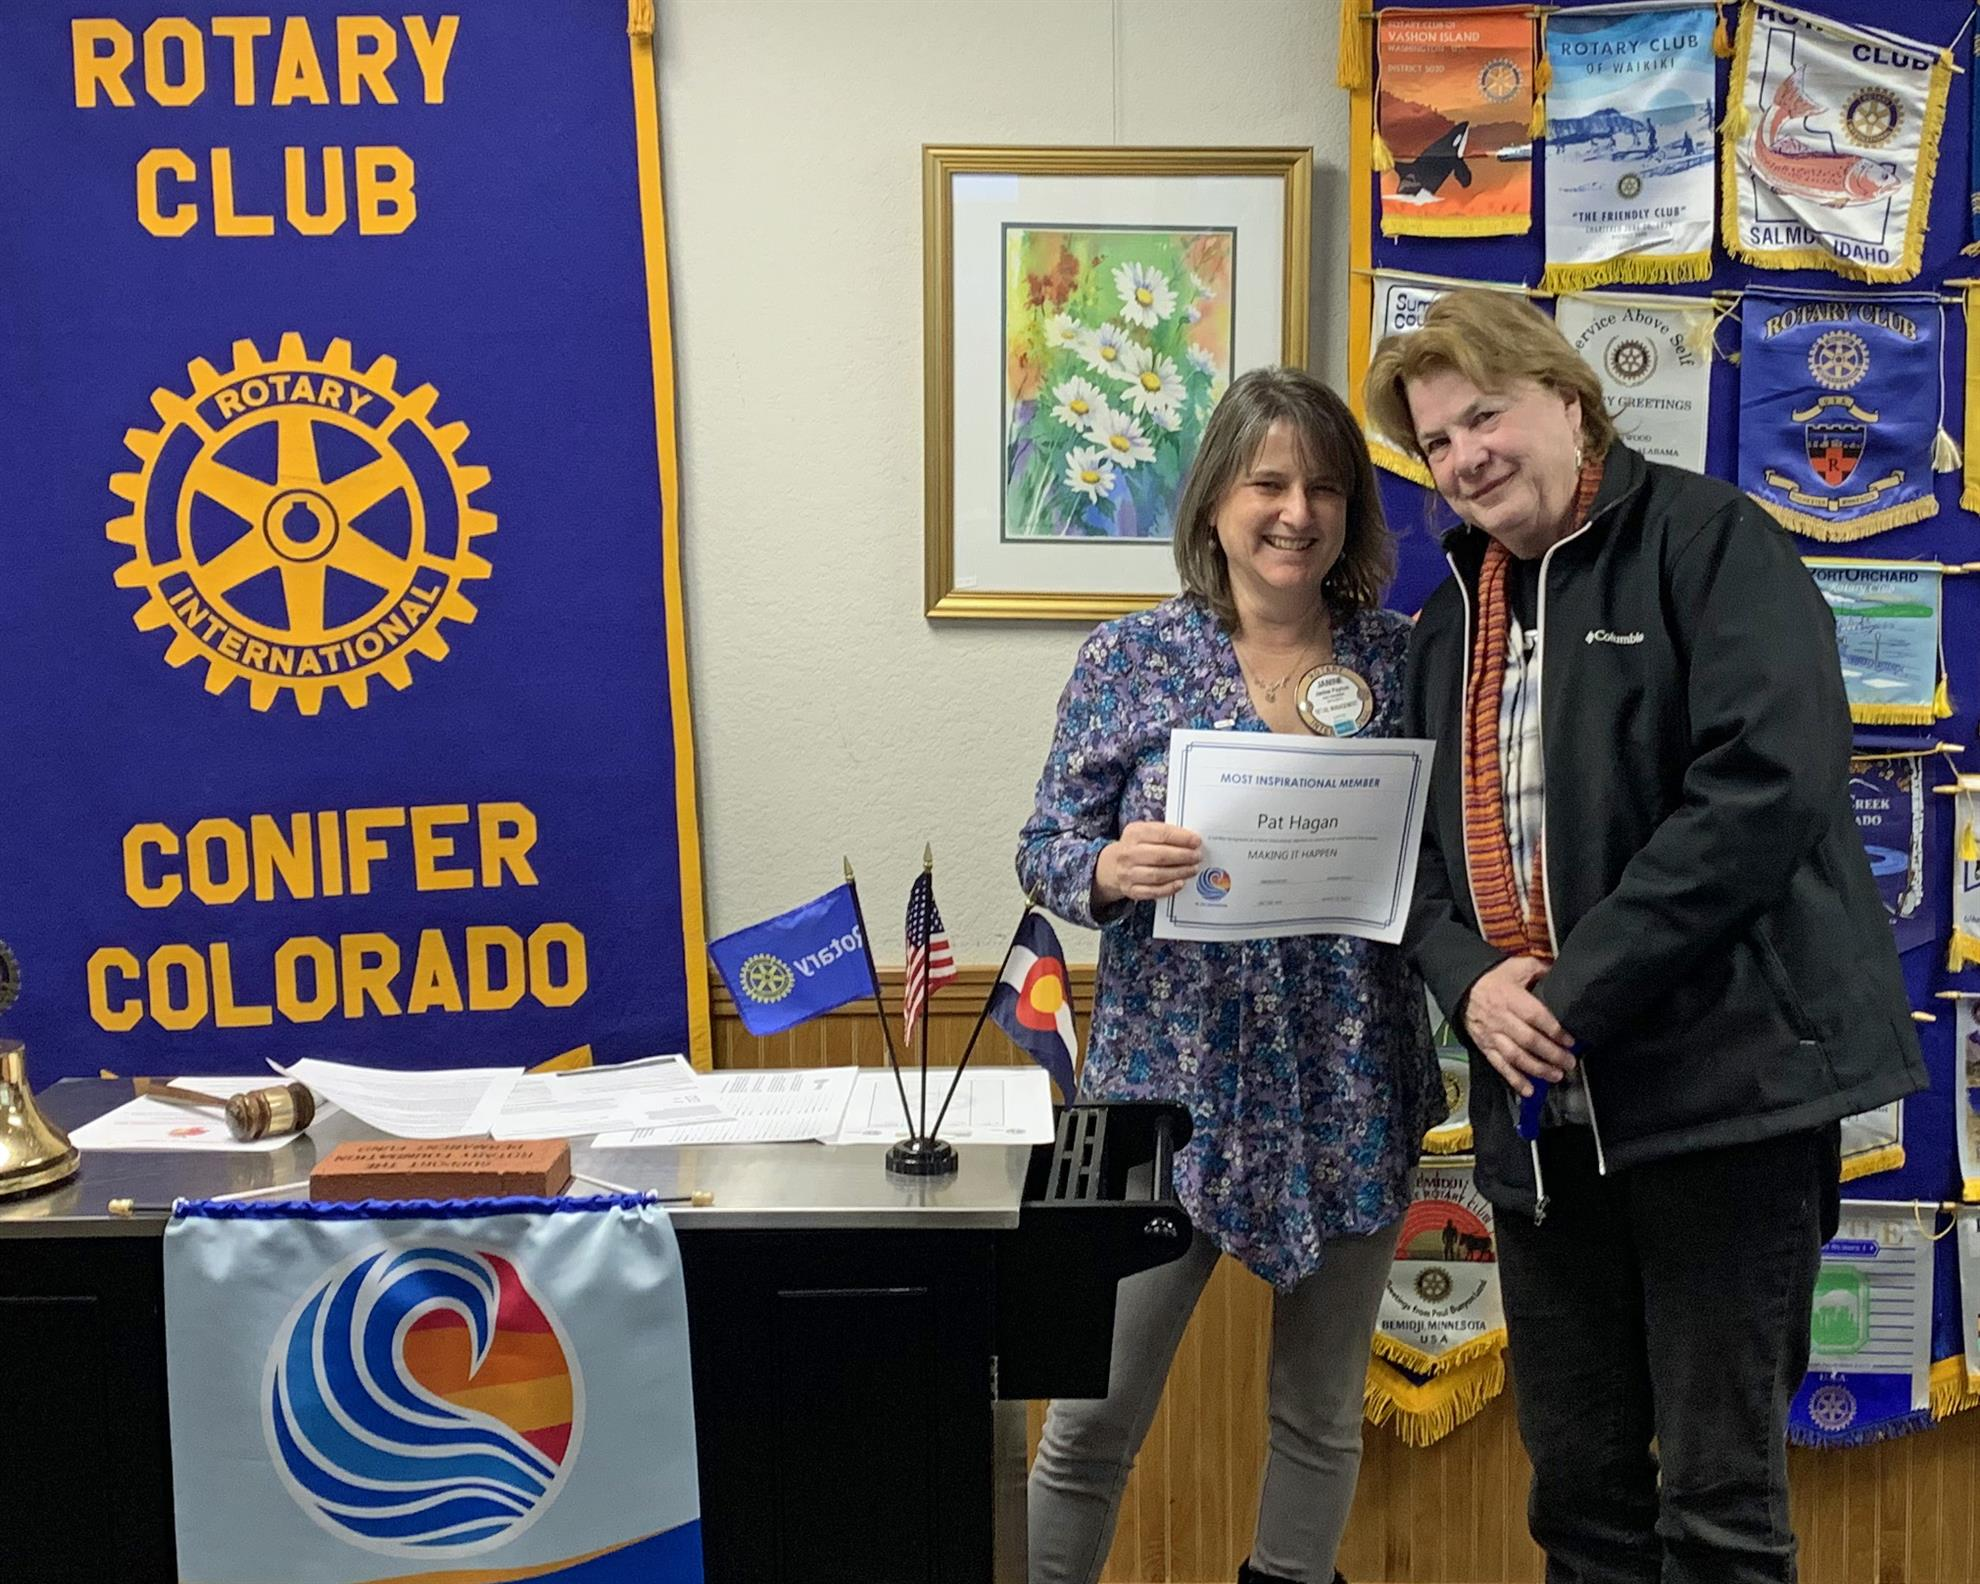 Stories | Rotary Club of Conifer, Colorado